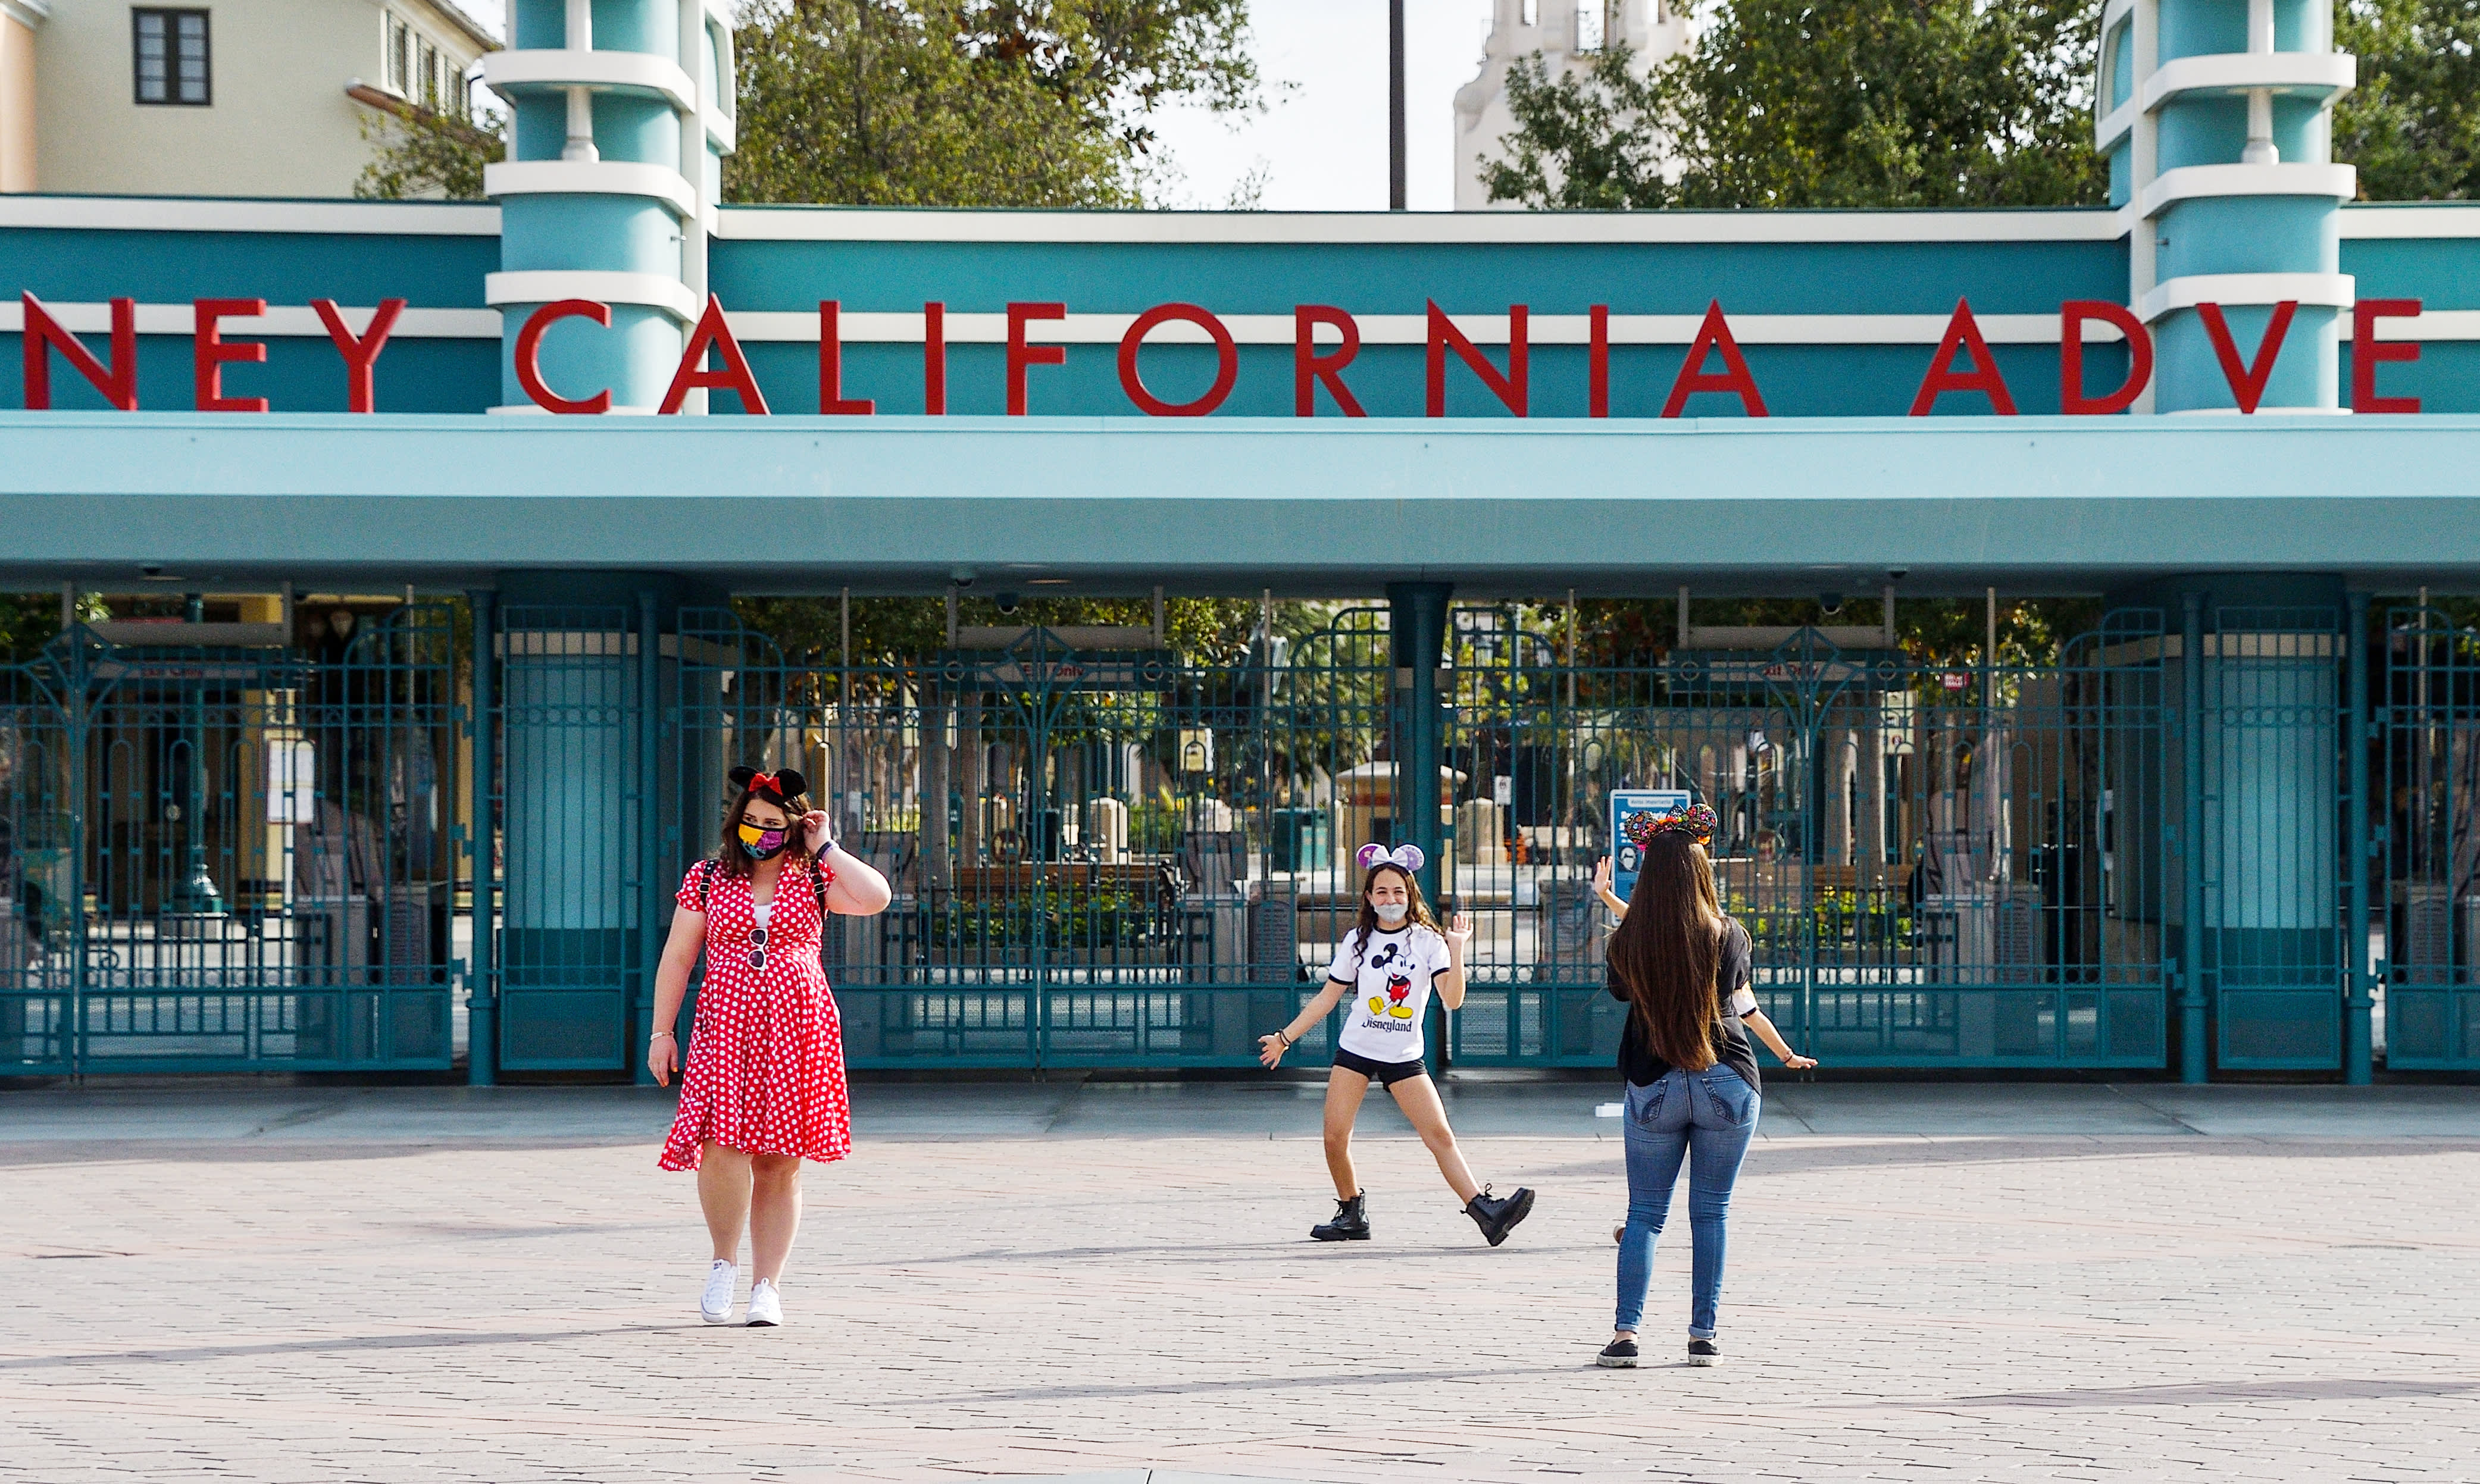 Disneyland to reopen on April 30 Disney CEO Bob Chapek says – CNBC